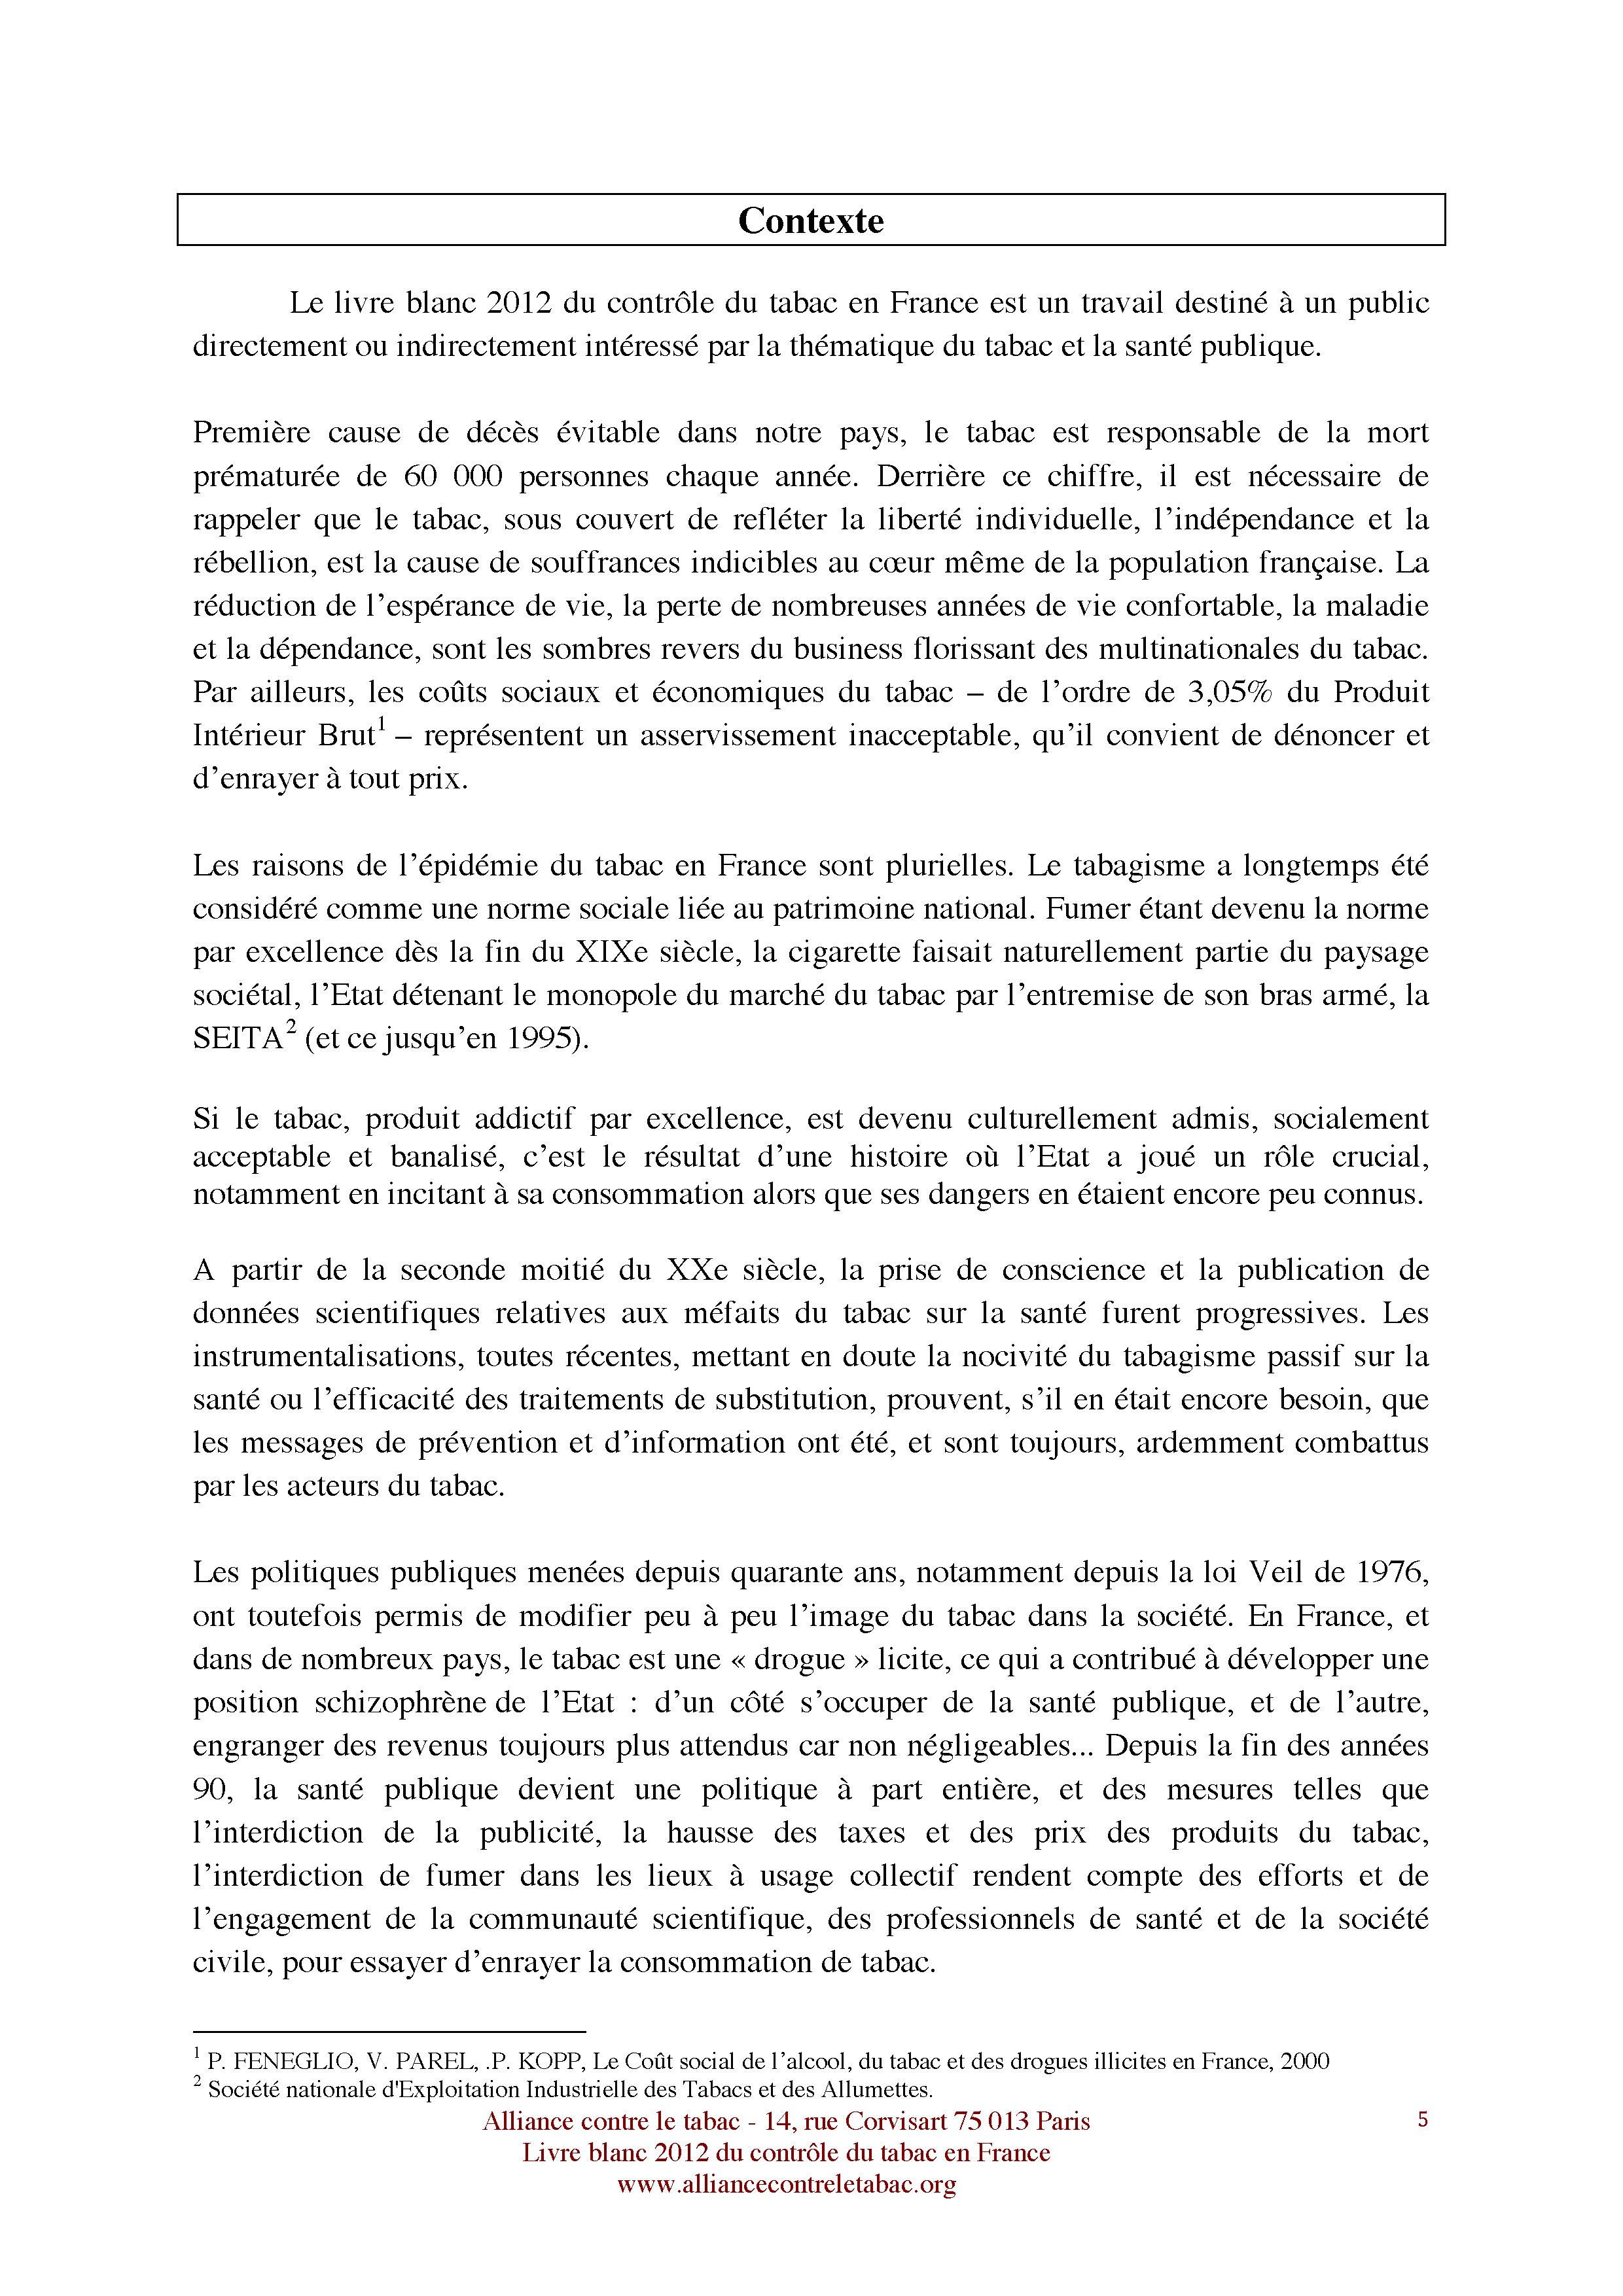 Alliance-dossier-presse_livre-blanc-22mars2012_Page_05.jpg